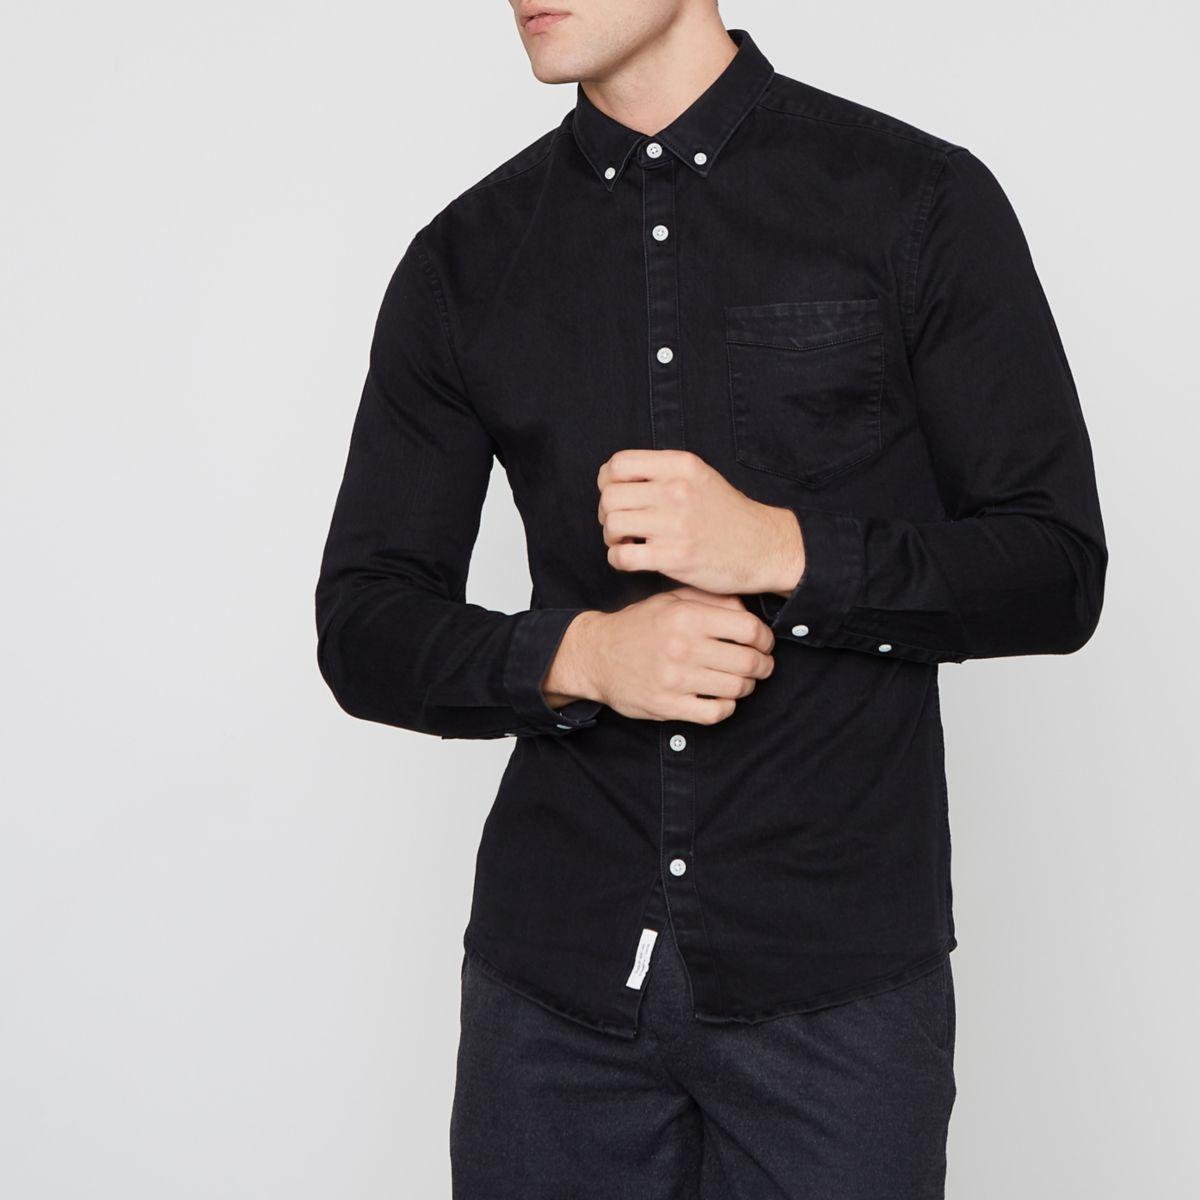 Black muscle fit button-down denim shirt